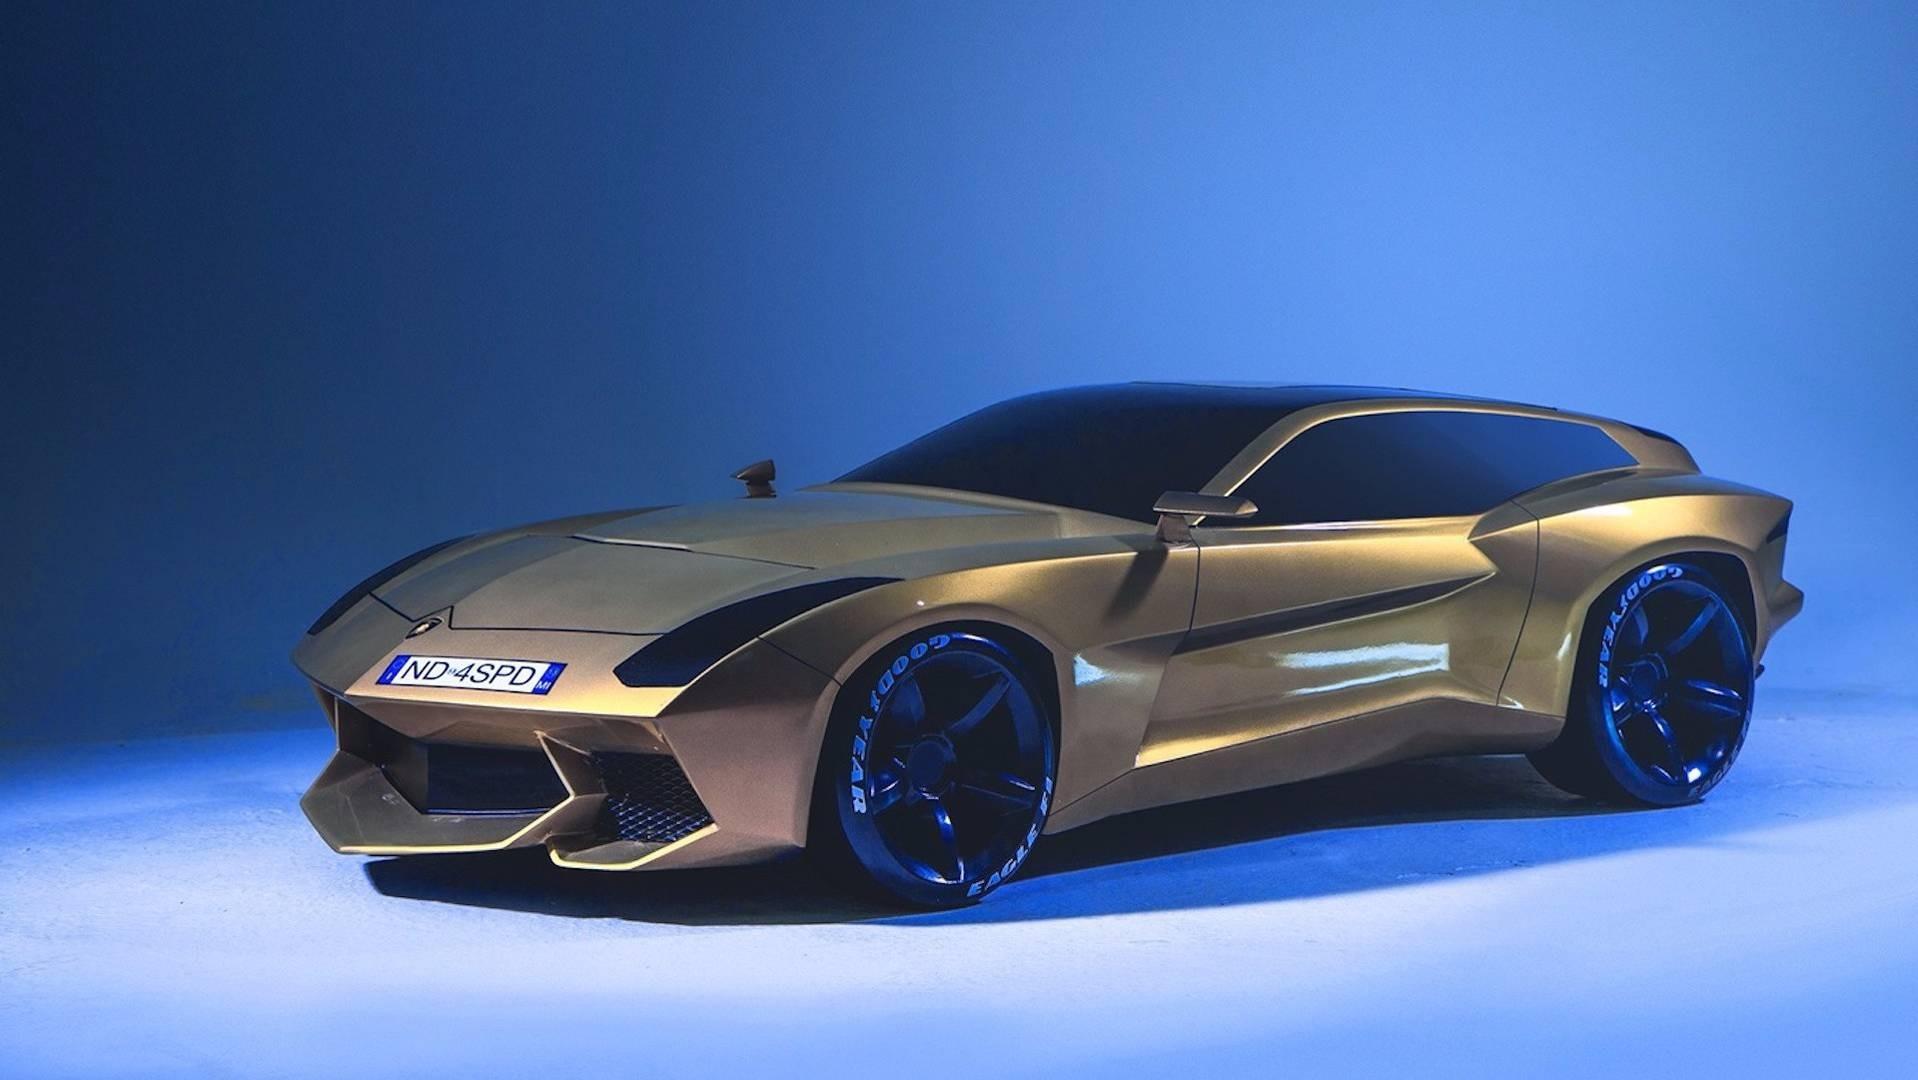 Концепт-кар Lamborghini Shooting Brake наврядли будет реальностью